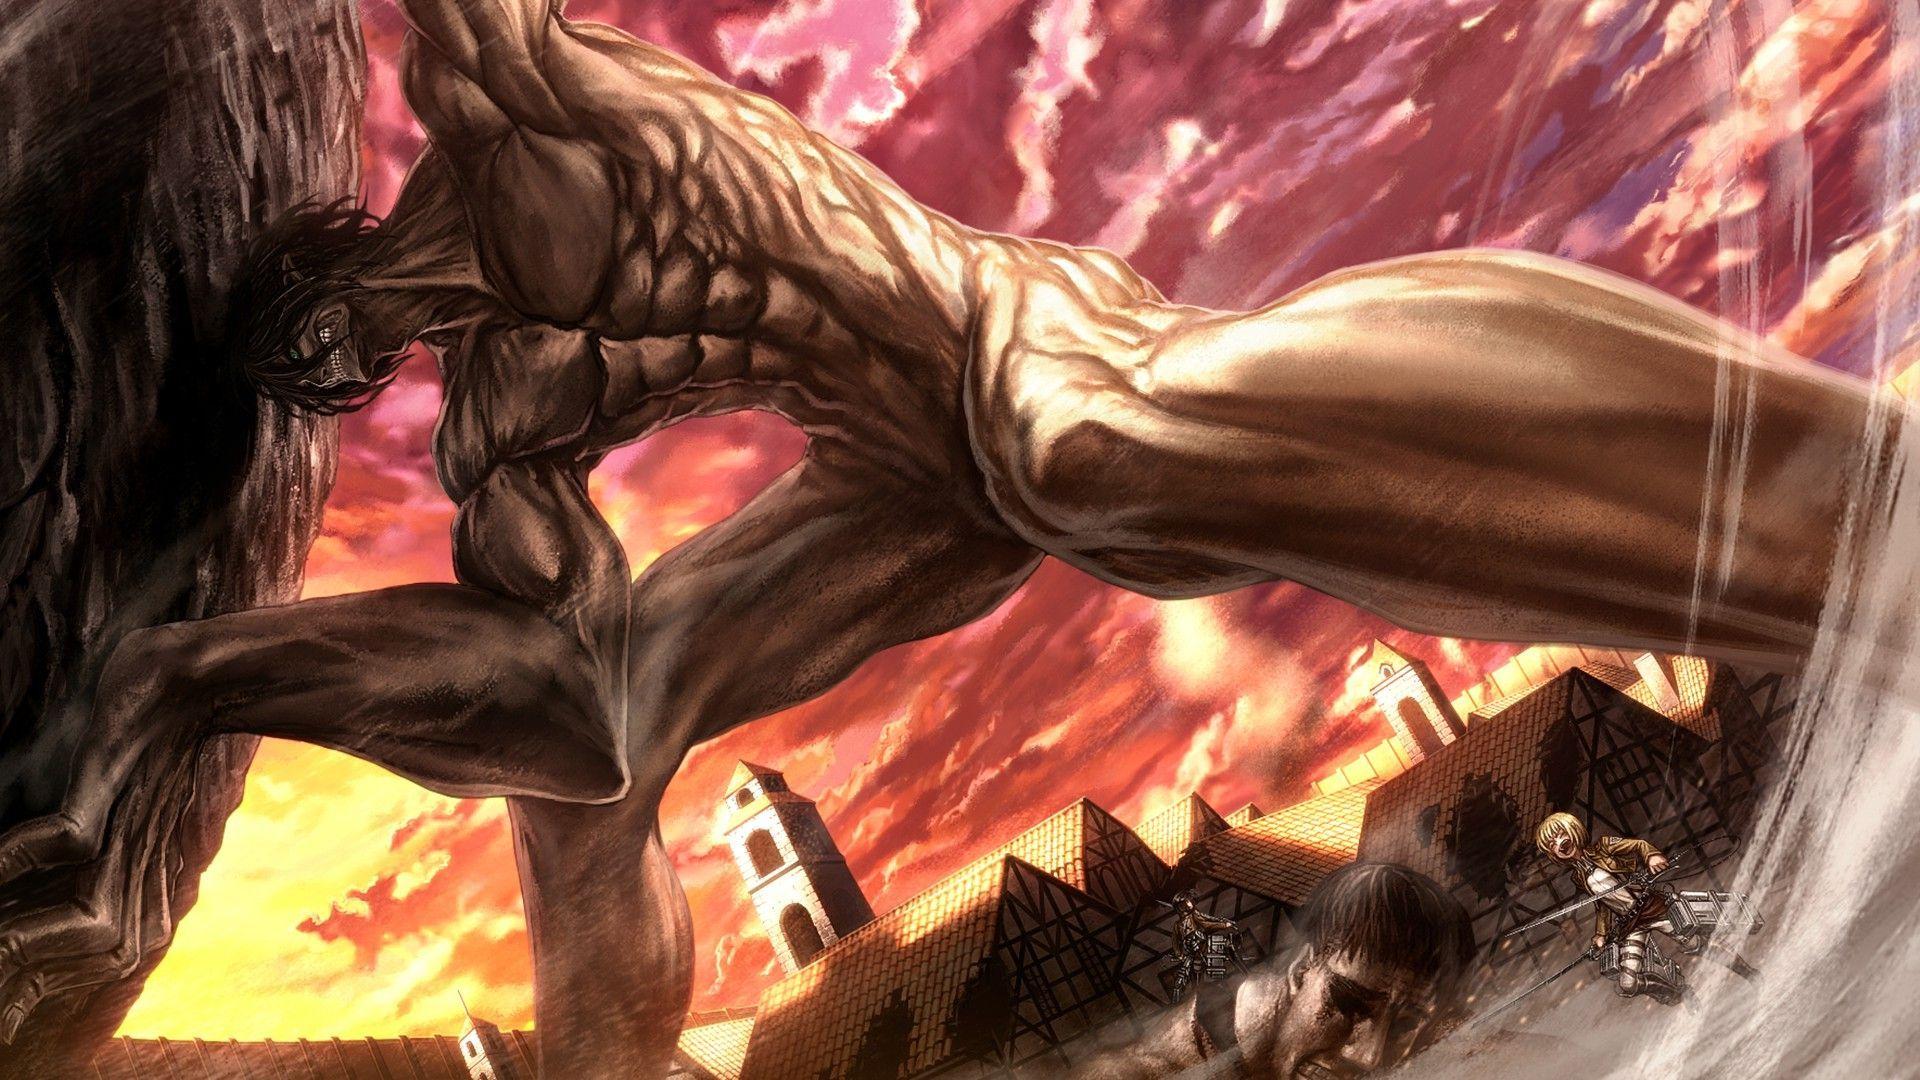 Attack On Titan Wallpaper Attack On Titan Wallpaper Titans 1920x1080 Wallpaper Teahub Io